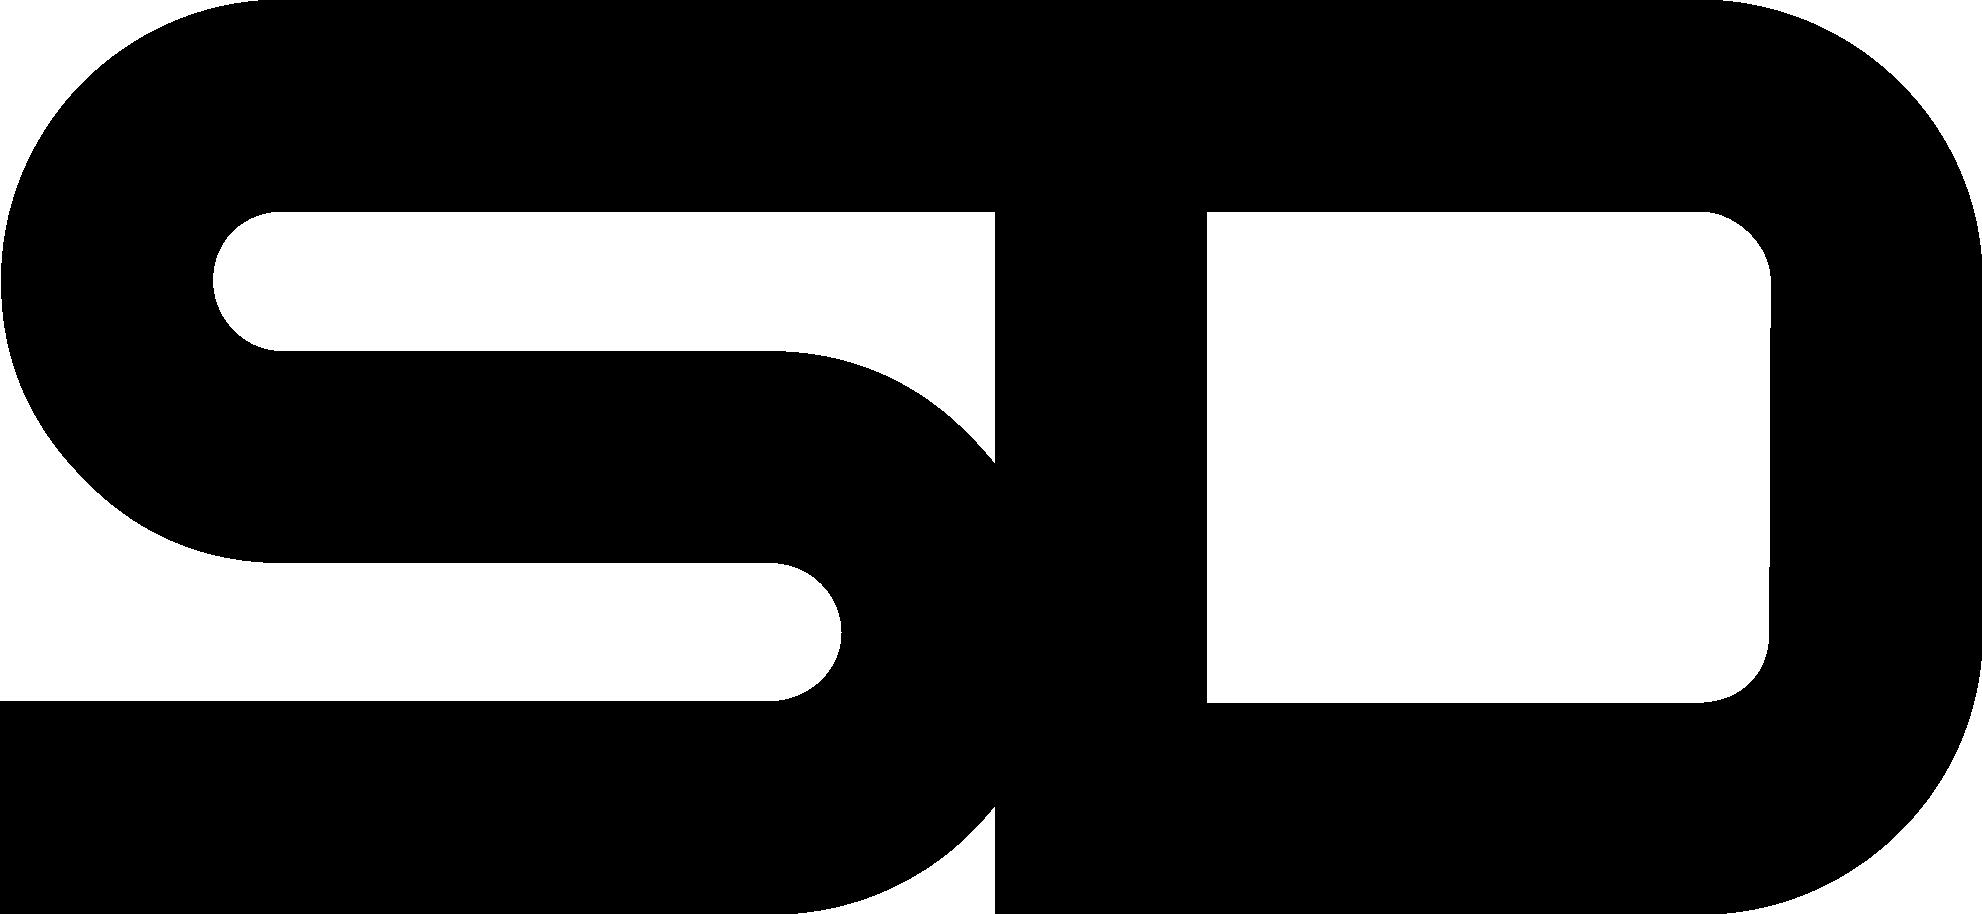 SD_Fav_512x512_schwarz